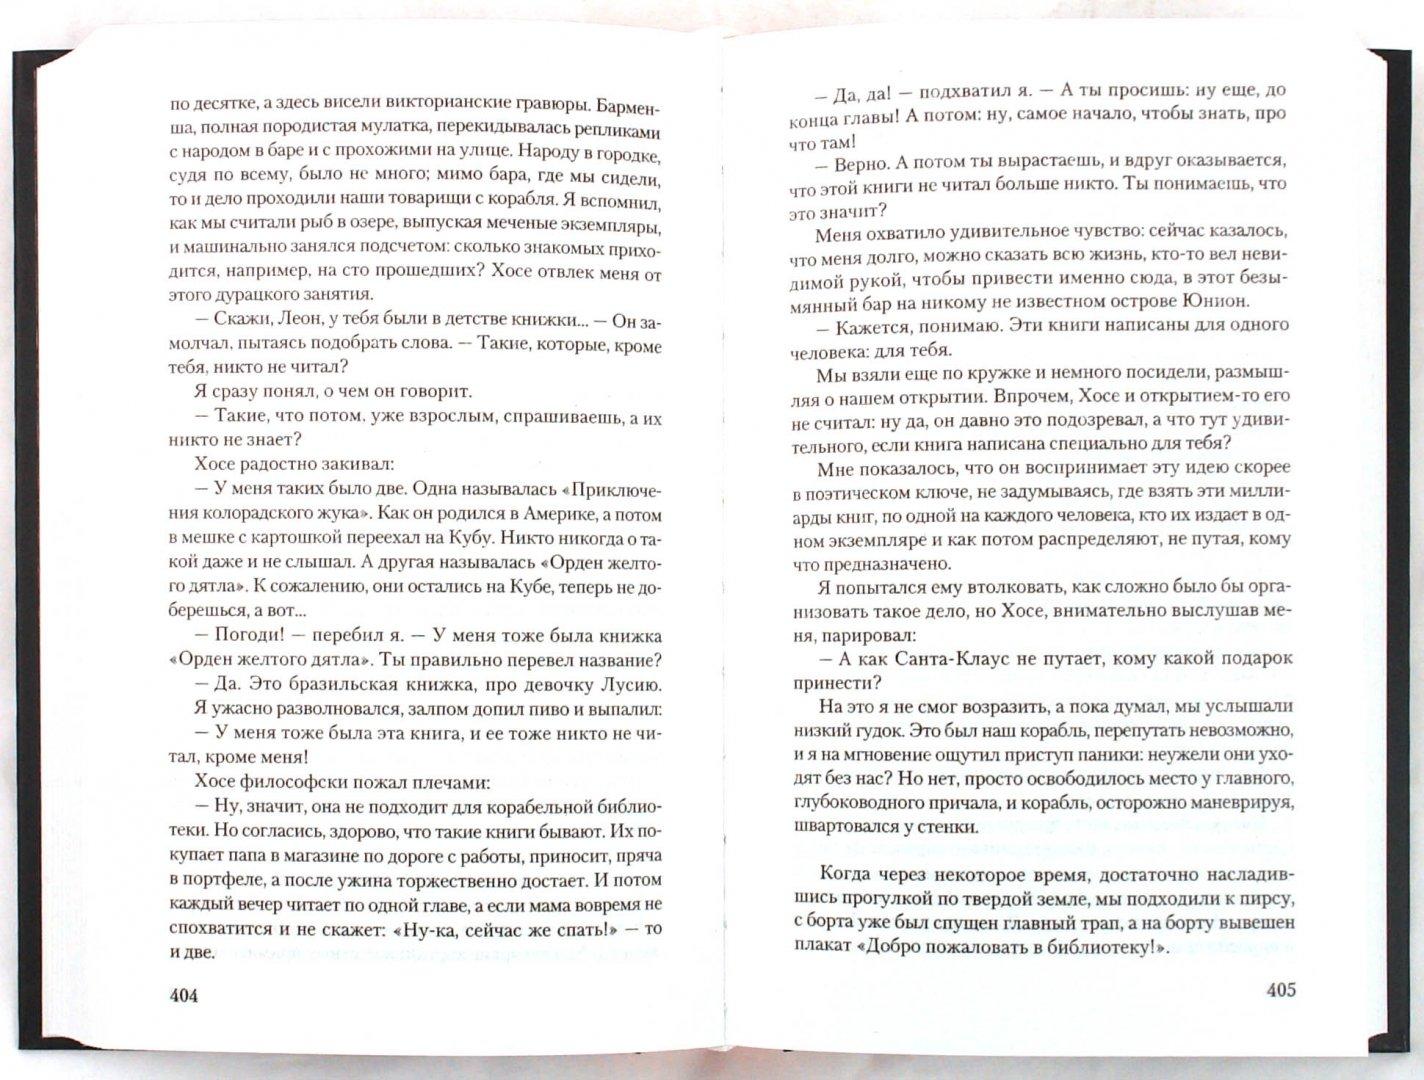 Иллюстрация 1 из 7 для Вавилонский голландец - Фрай, Тренд, Хеймец | Лабиринт - книги. Источник: Лабиринт